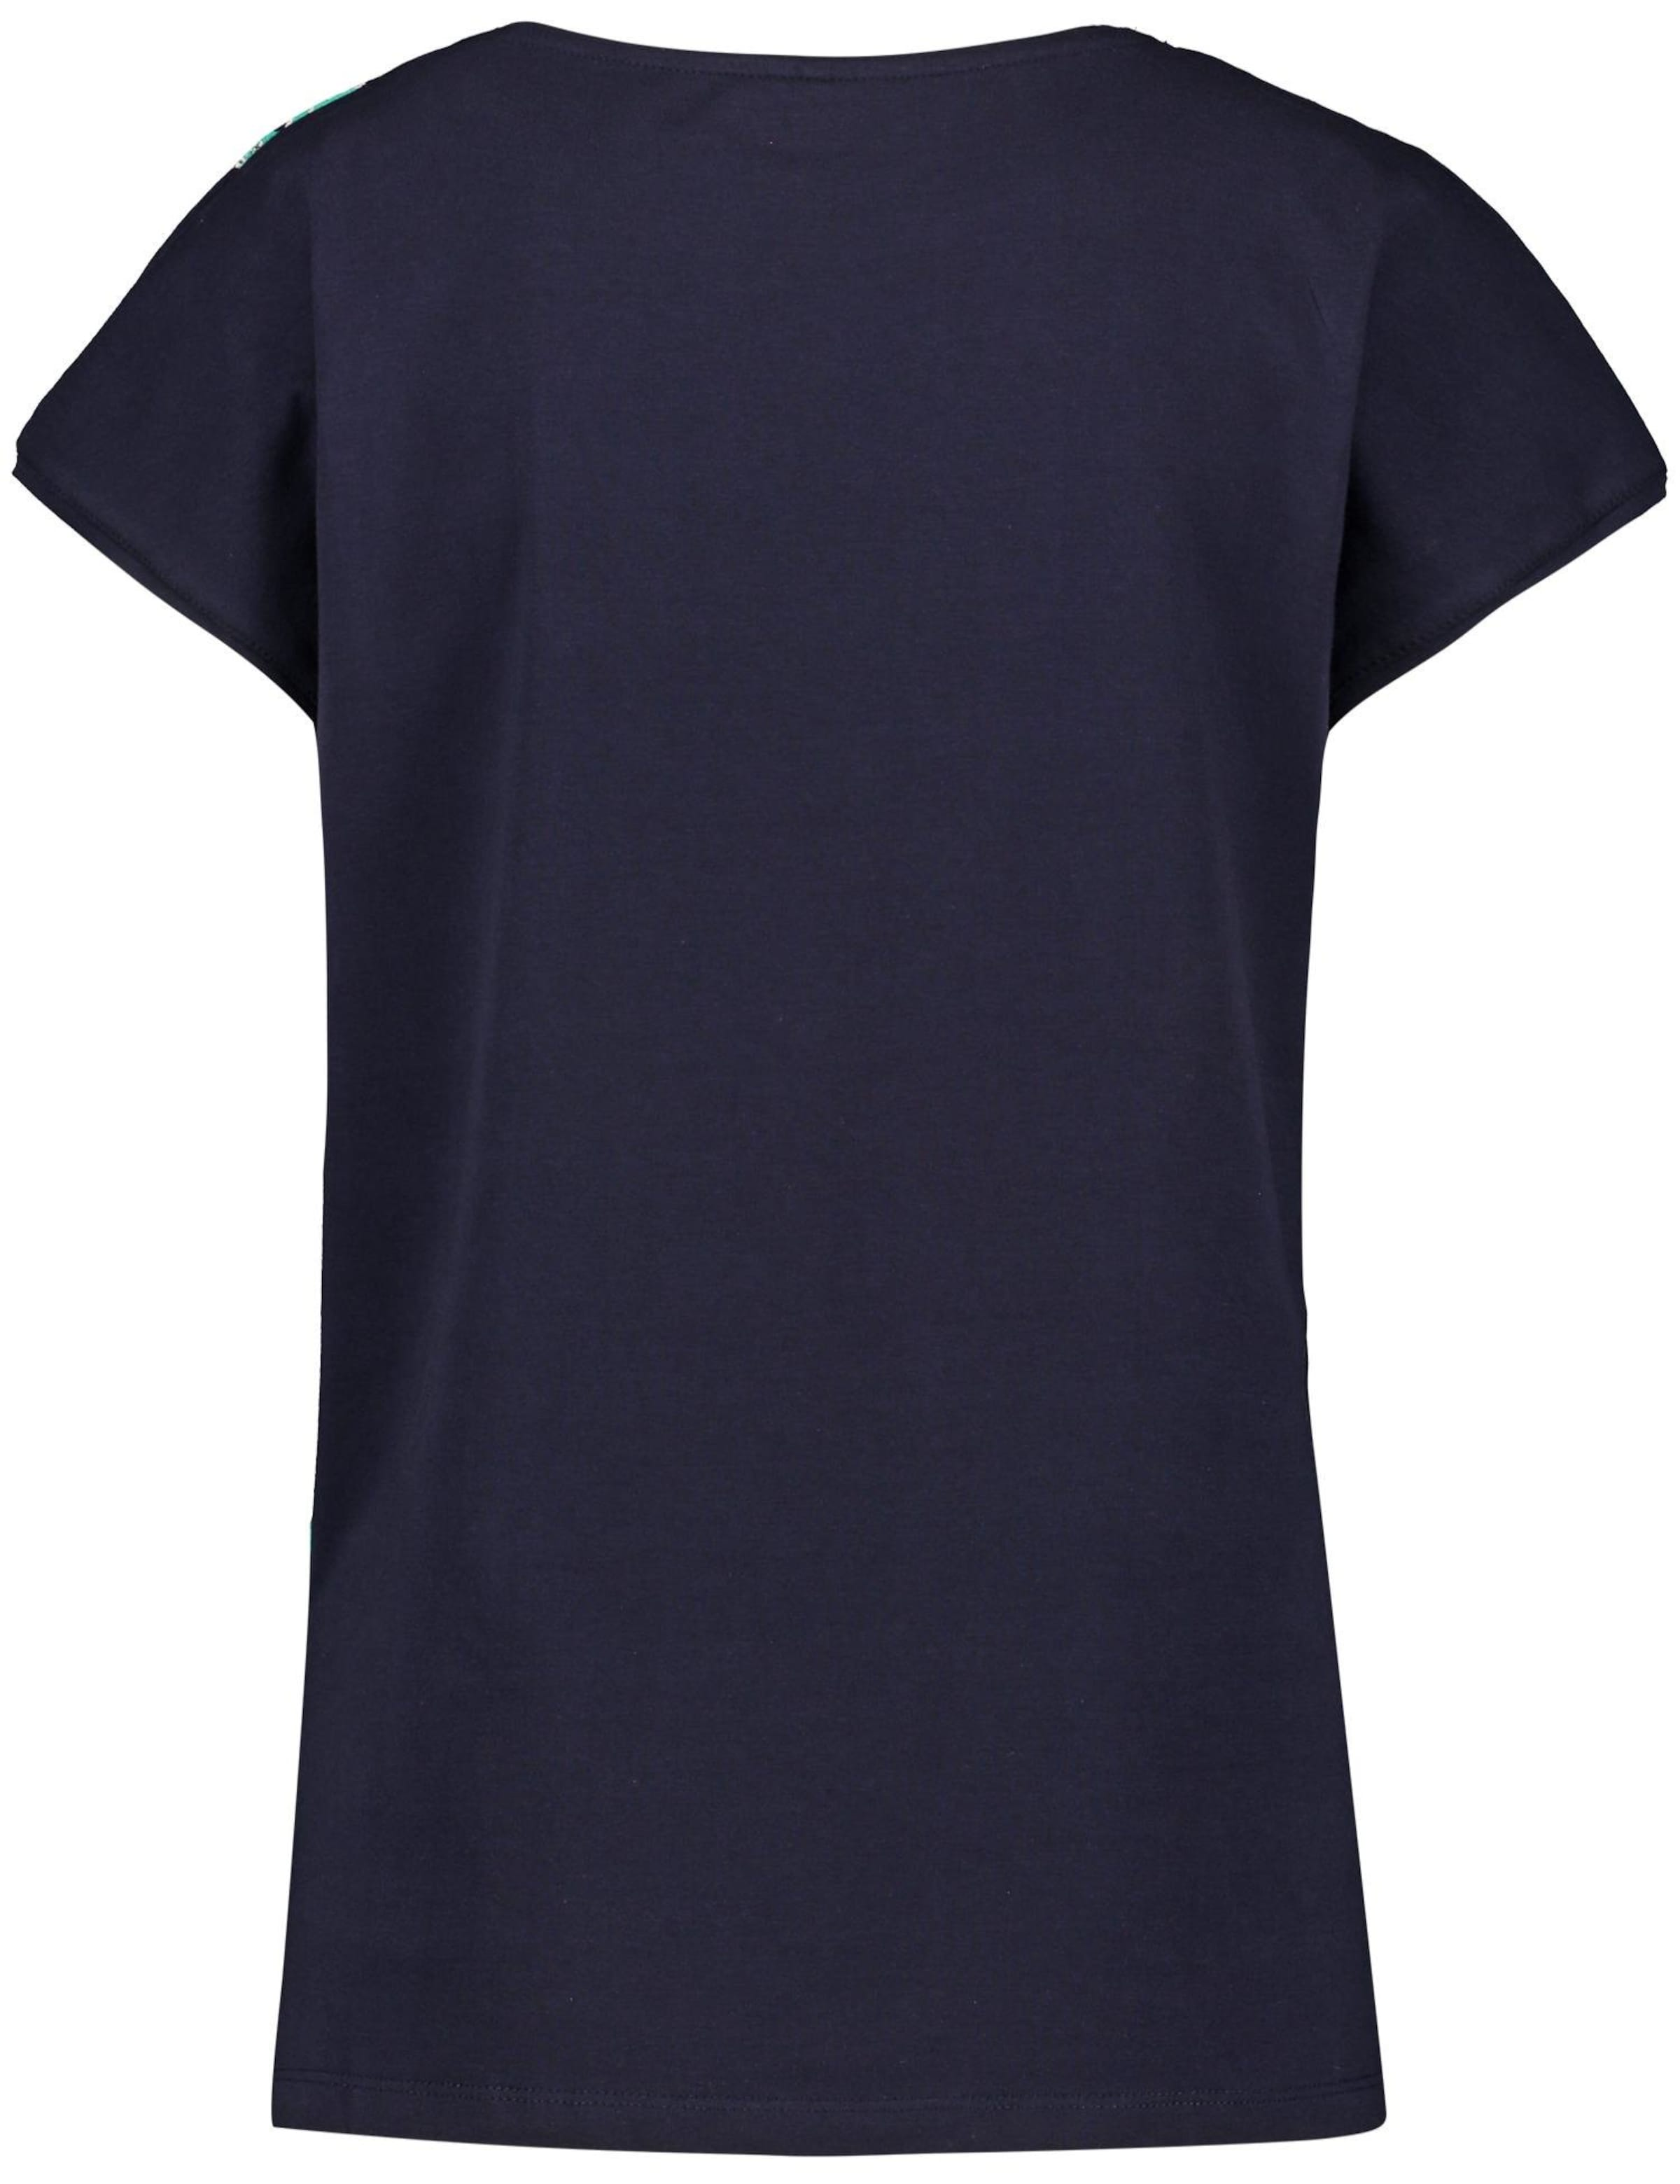 Ultramarinblau T Gerry shirt Weber In 0wvmN8n